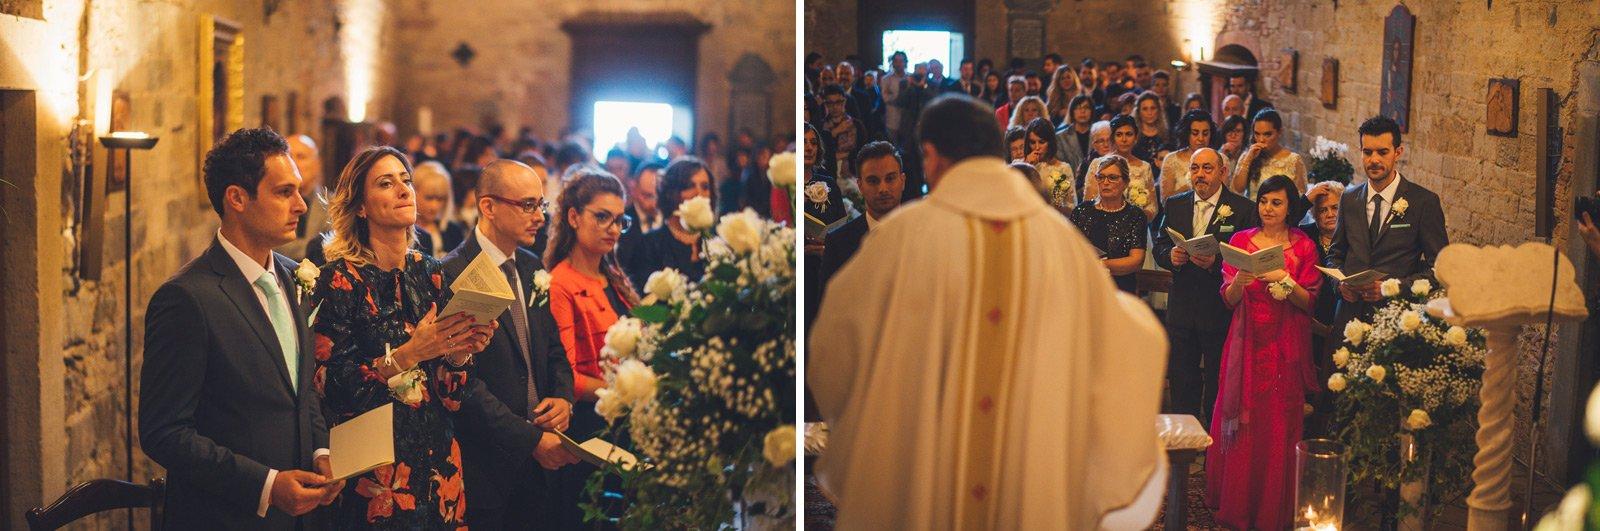 038-wedding-florence-palazzo-borghese